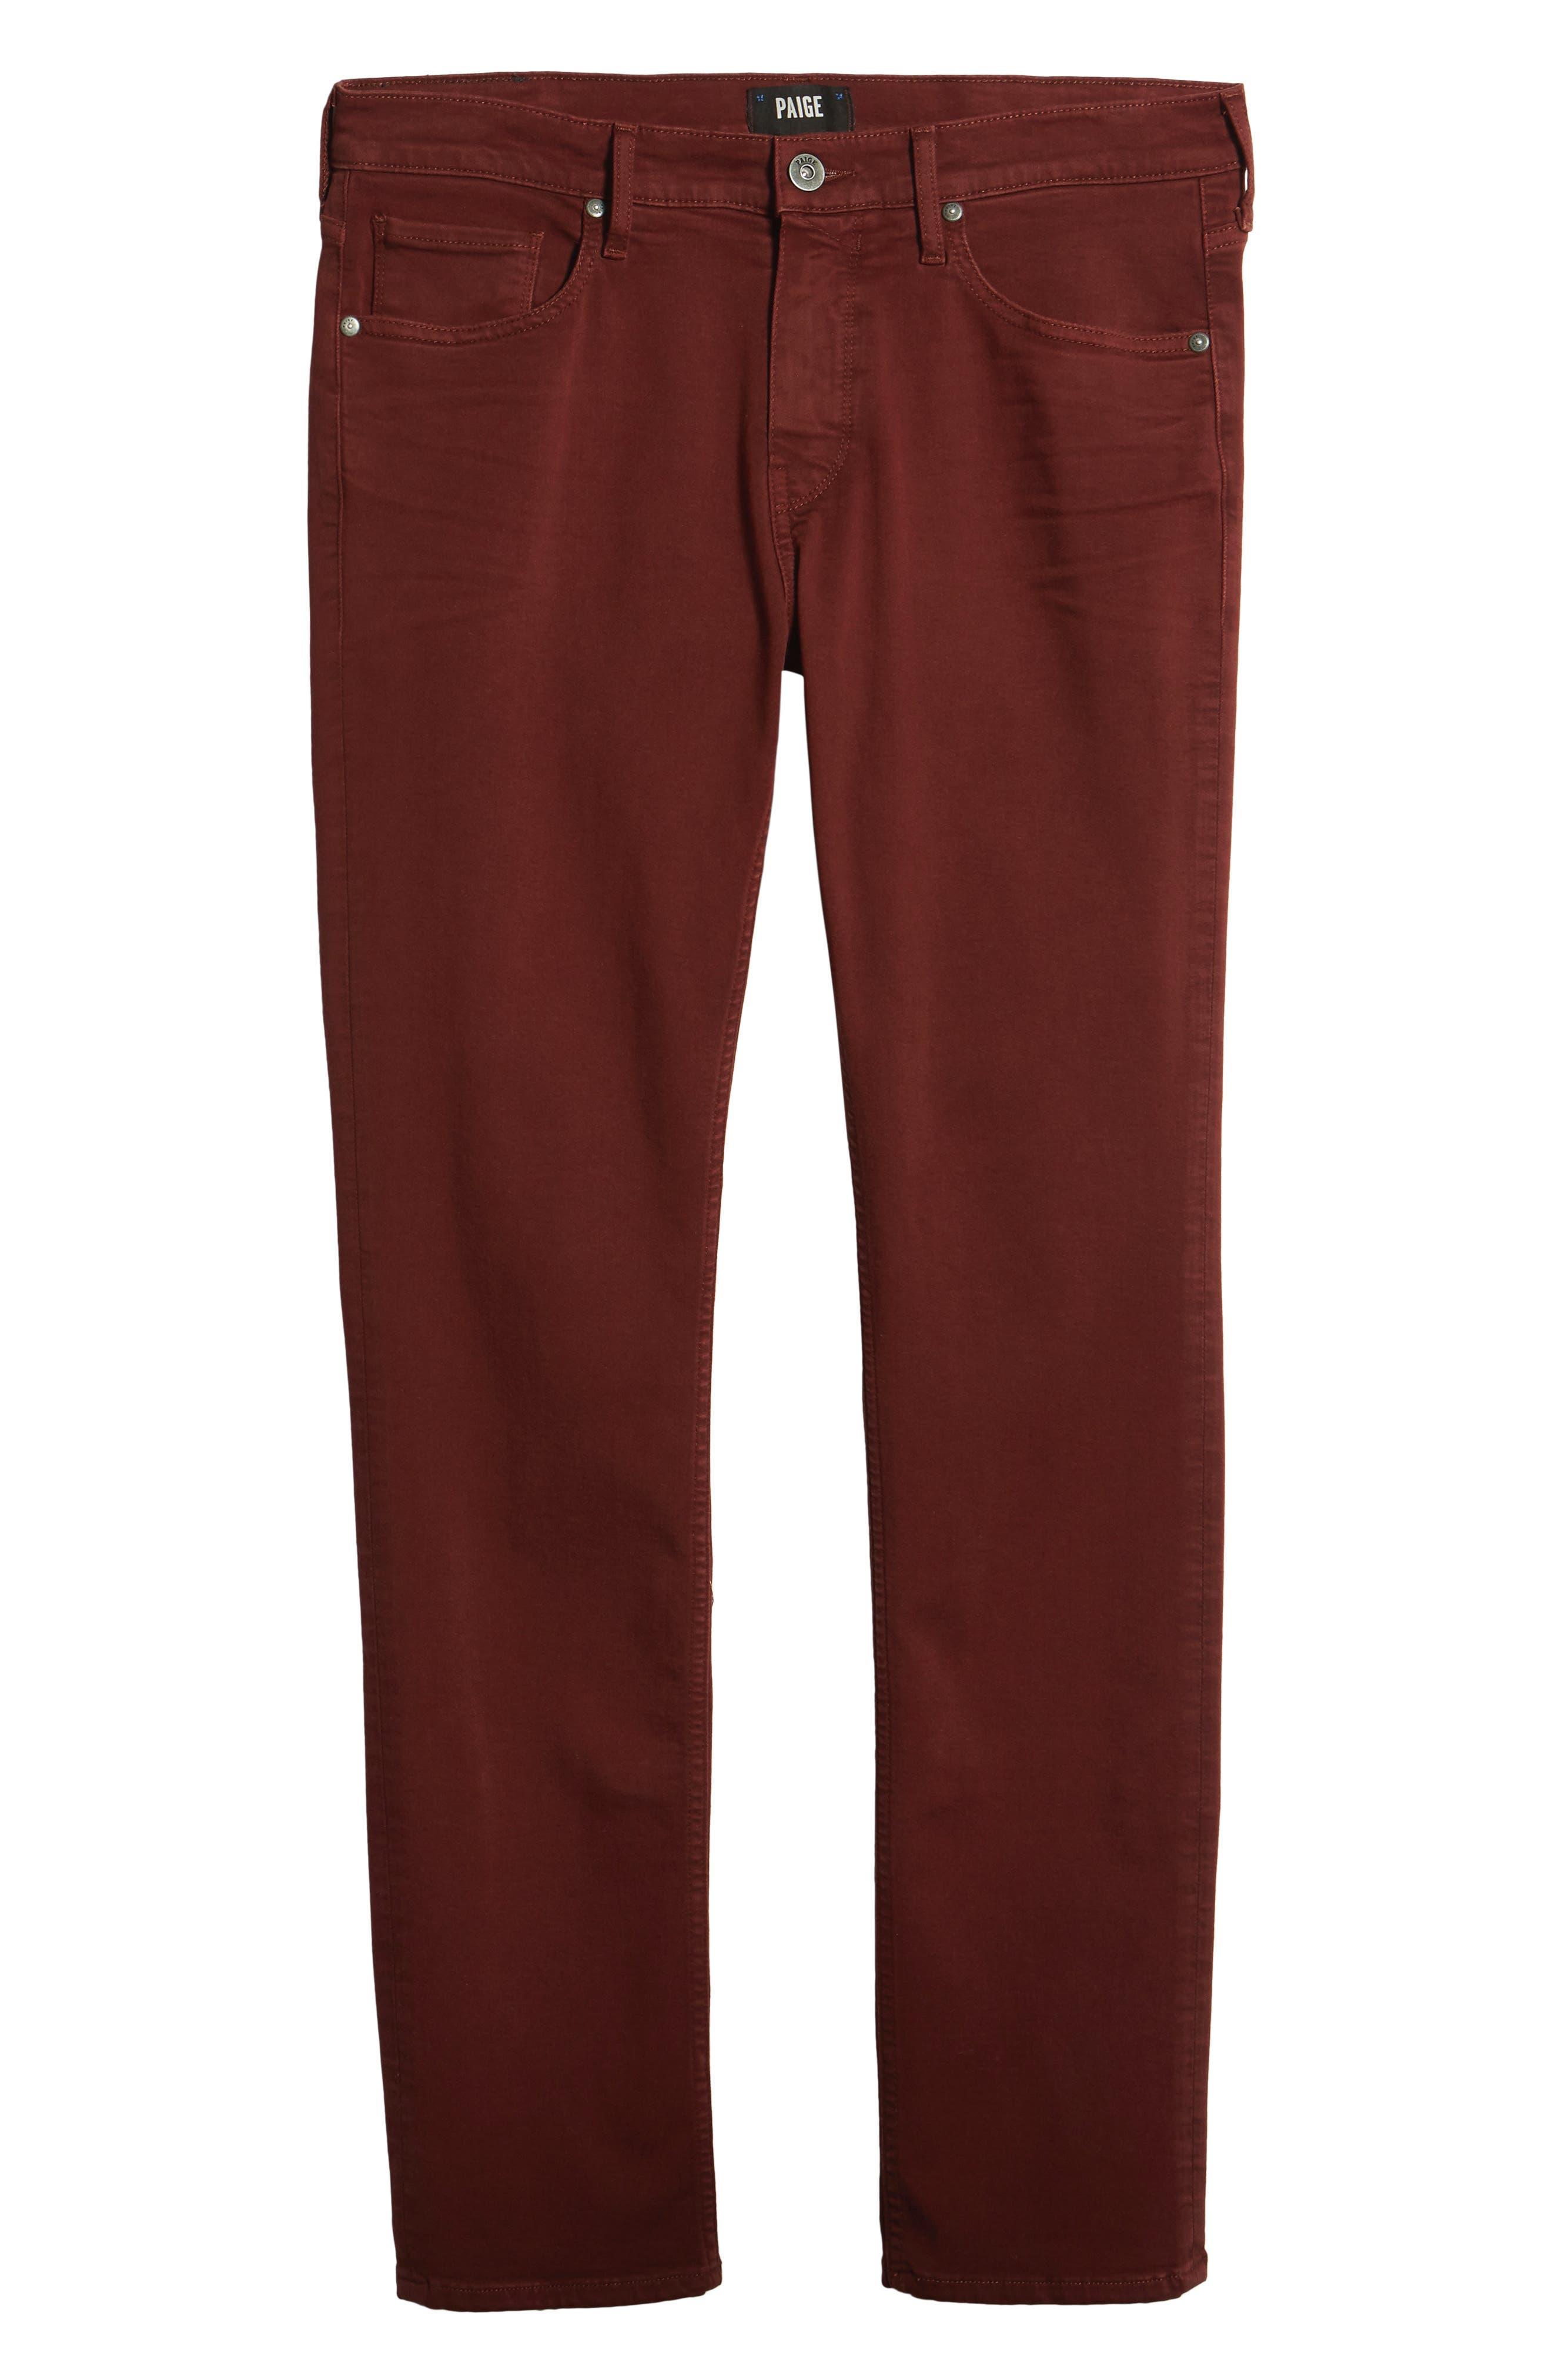 Federal Slim Straight Leg Jeans,                             Alternate thumbnail 6, color,                             600